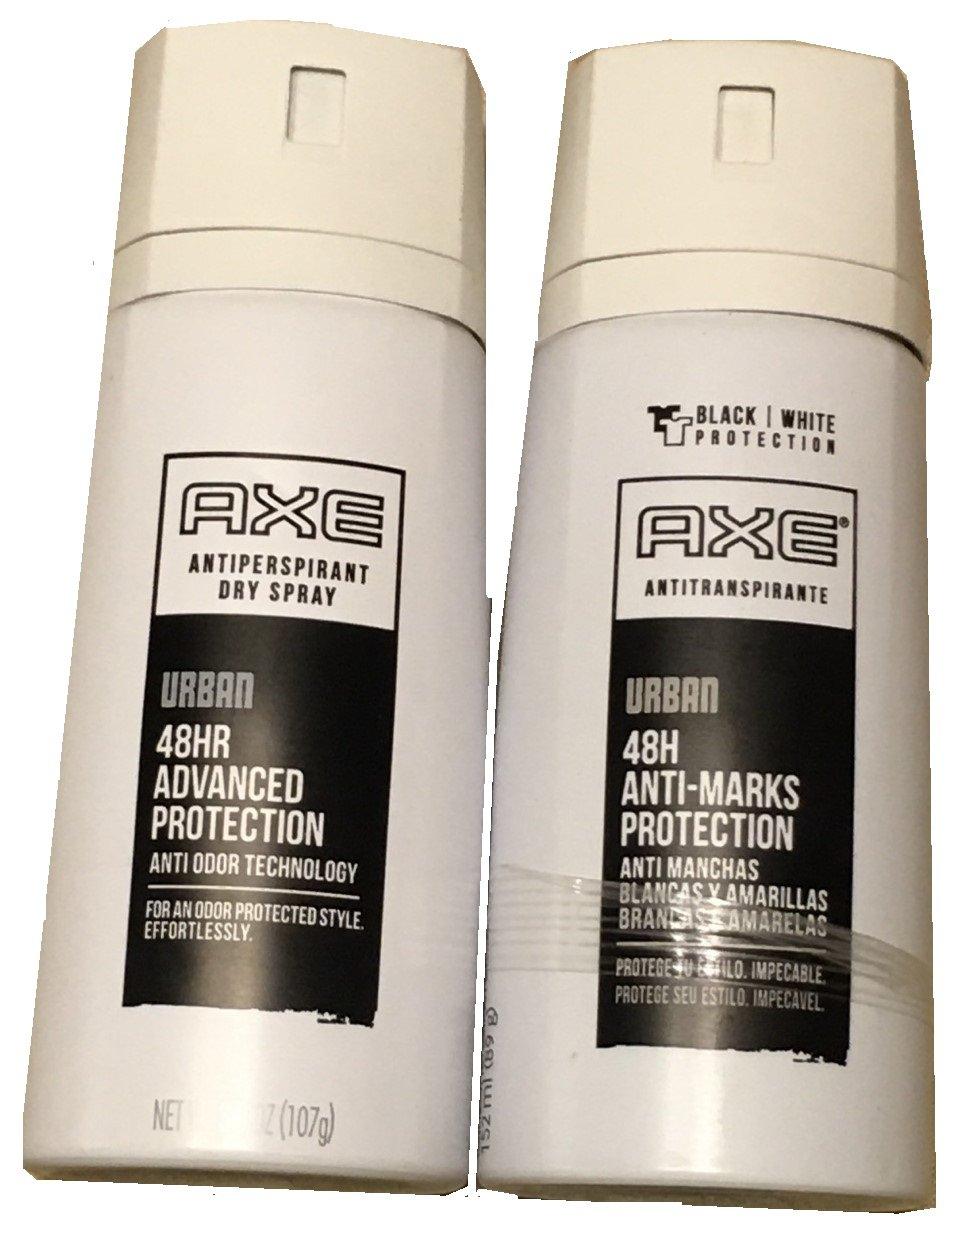 Axe Antiperspirant Dry Spray, Urban 3.80 oz (Pack of 2)